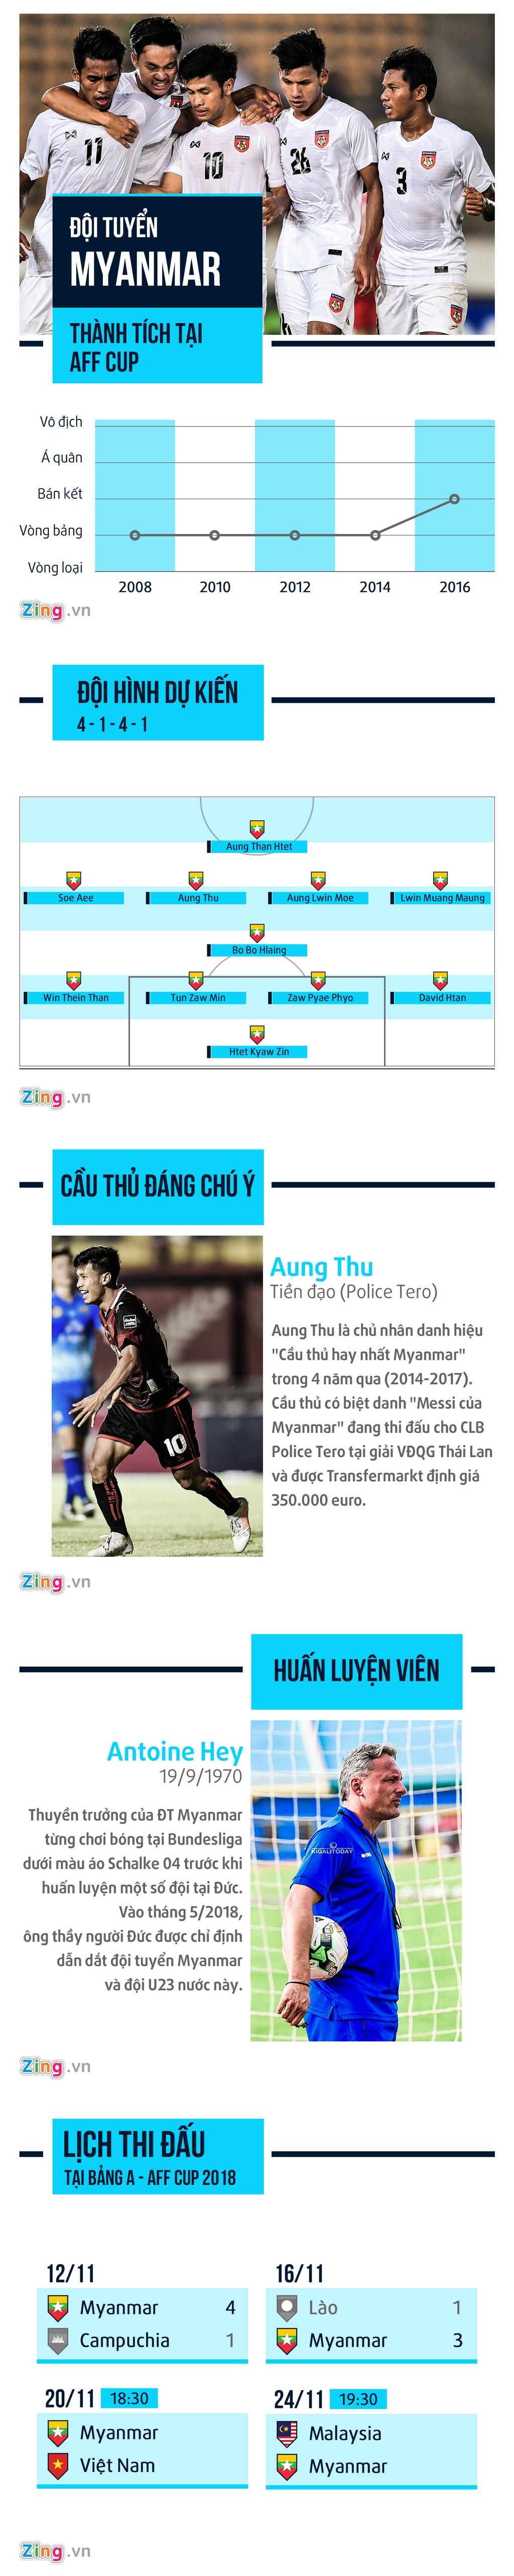 Myanmar - ke thach thuc ngoi dau bang cua tuyen Viet Nam hinh anh 1